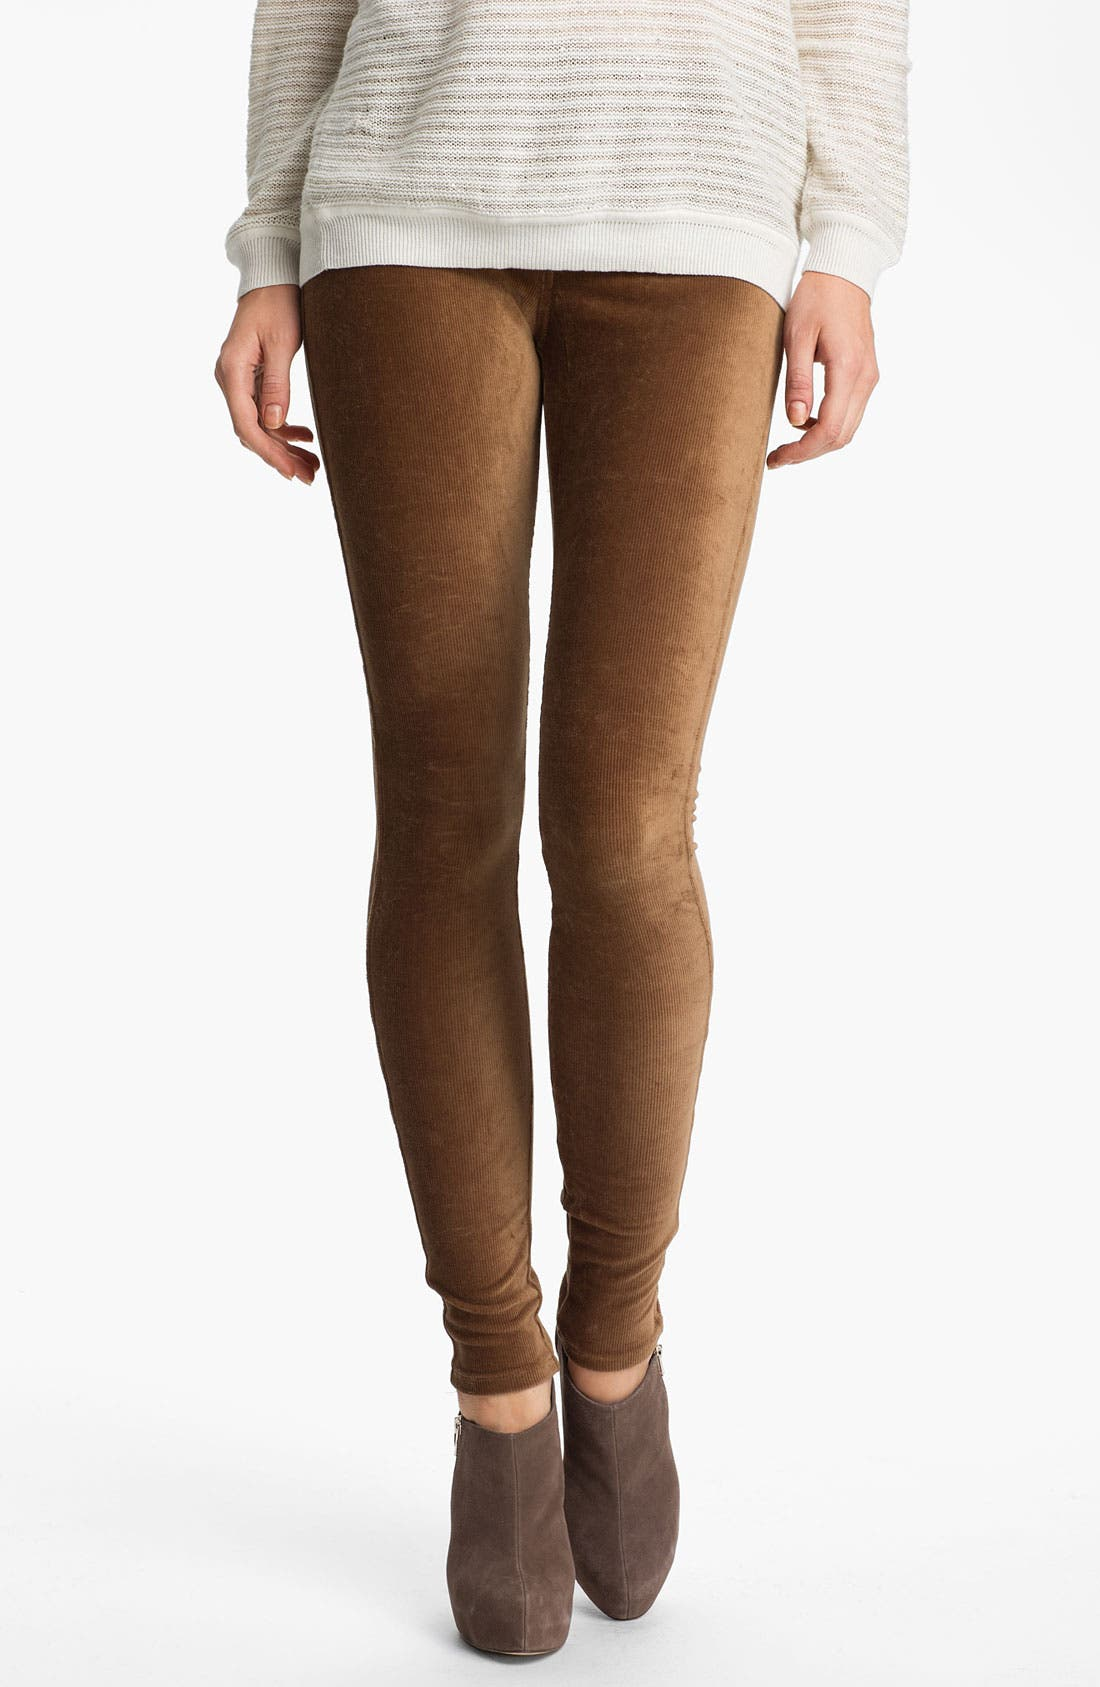 Alternate Image 1 Selected - Hue Corduroy Leggings